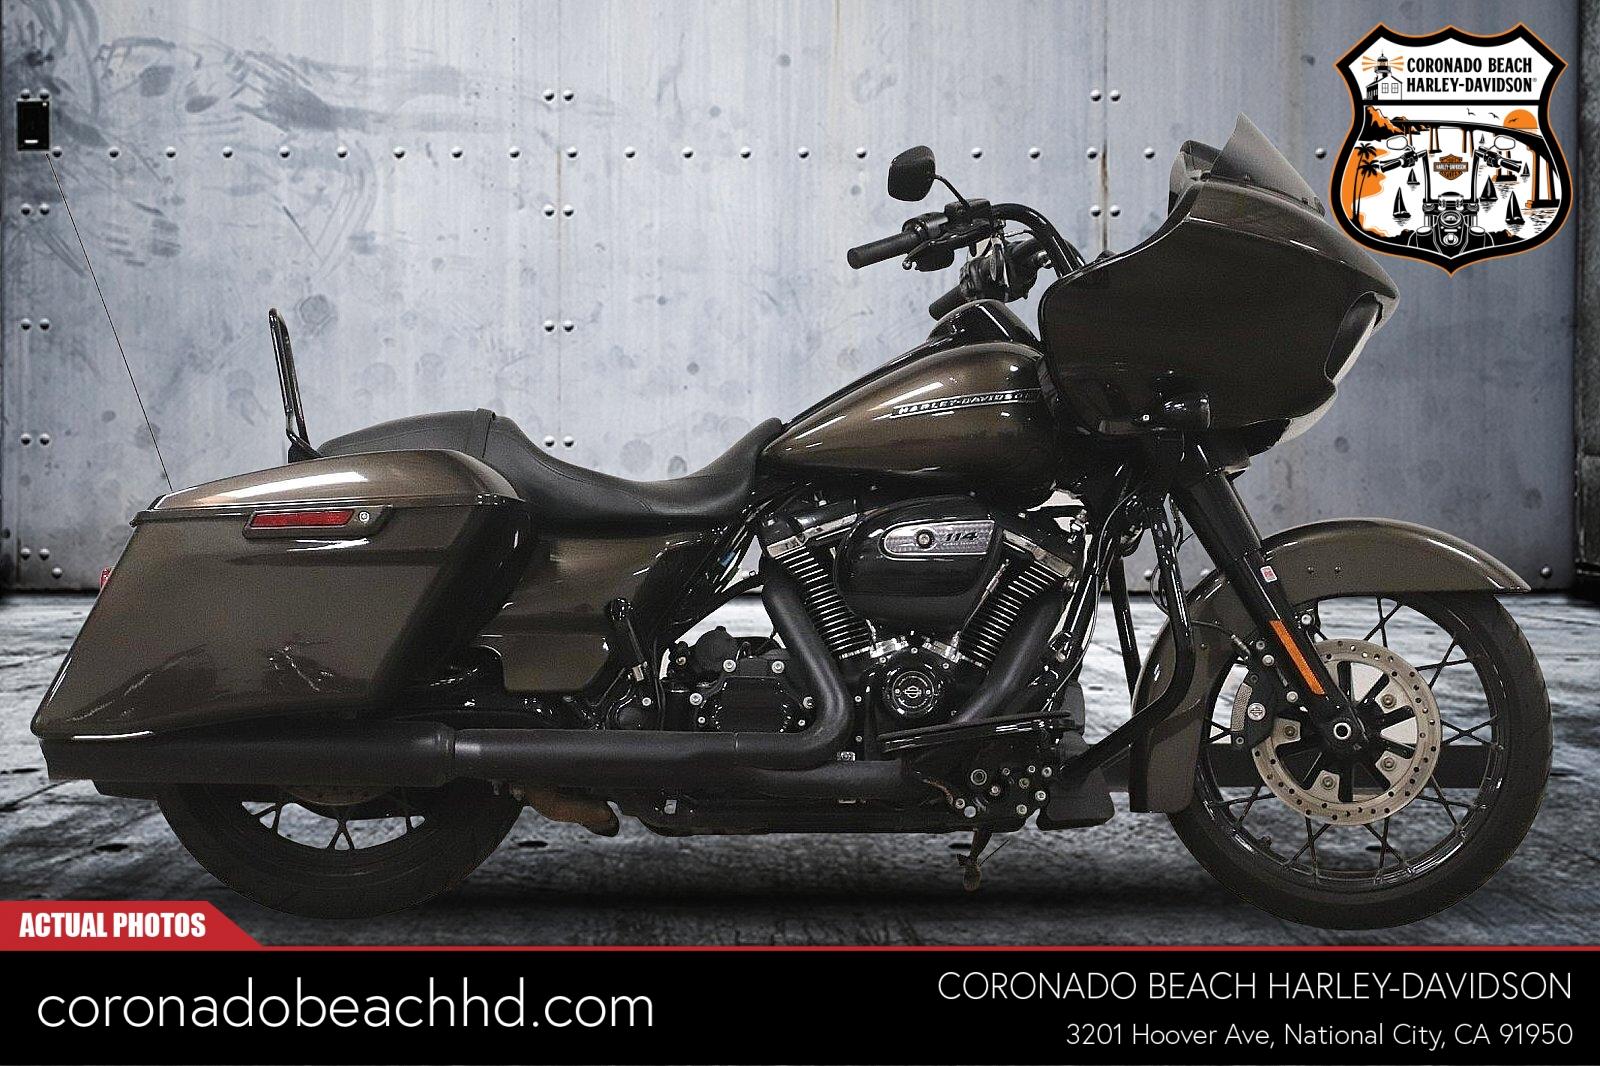 2020 Harley-Davidson Road Glide Special [79]